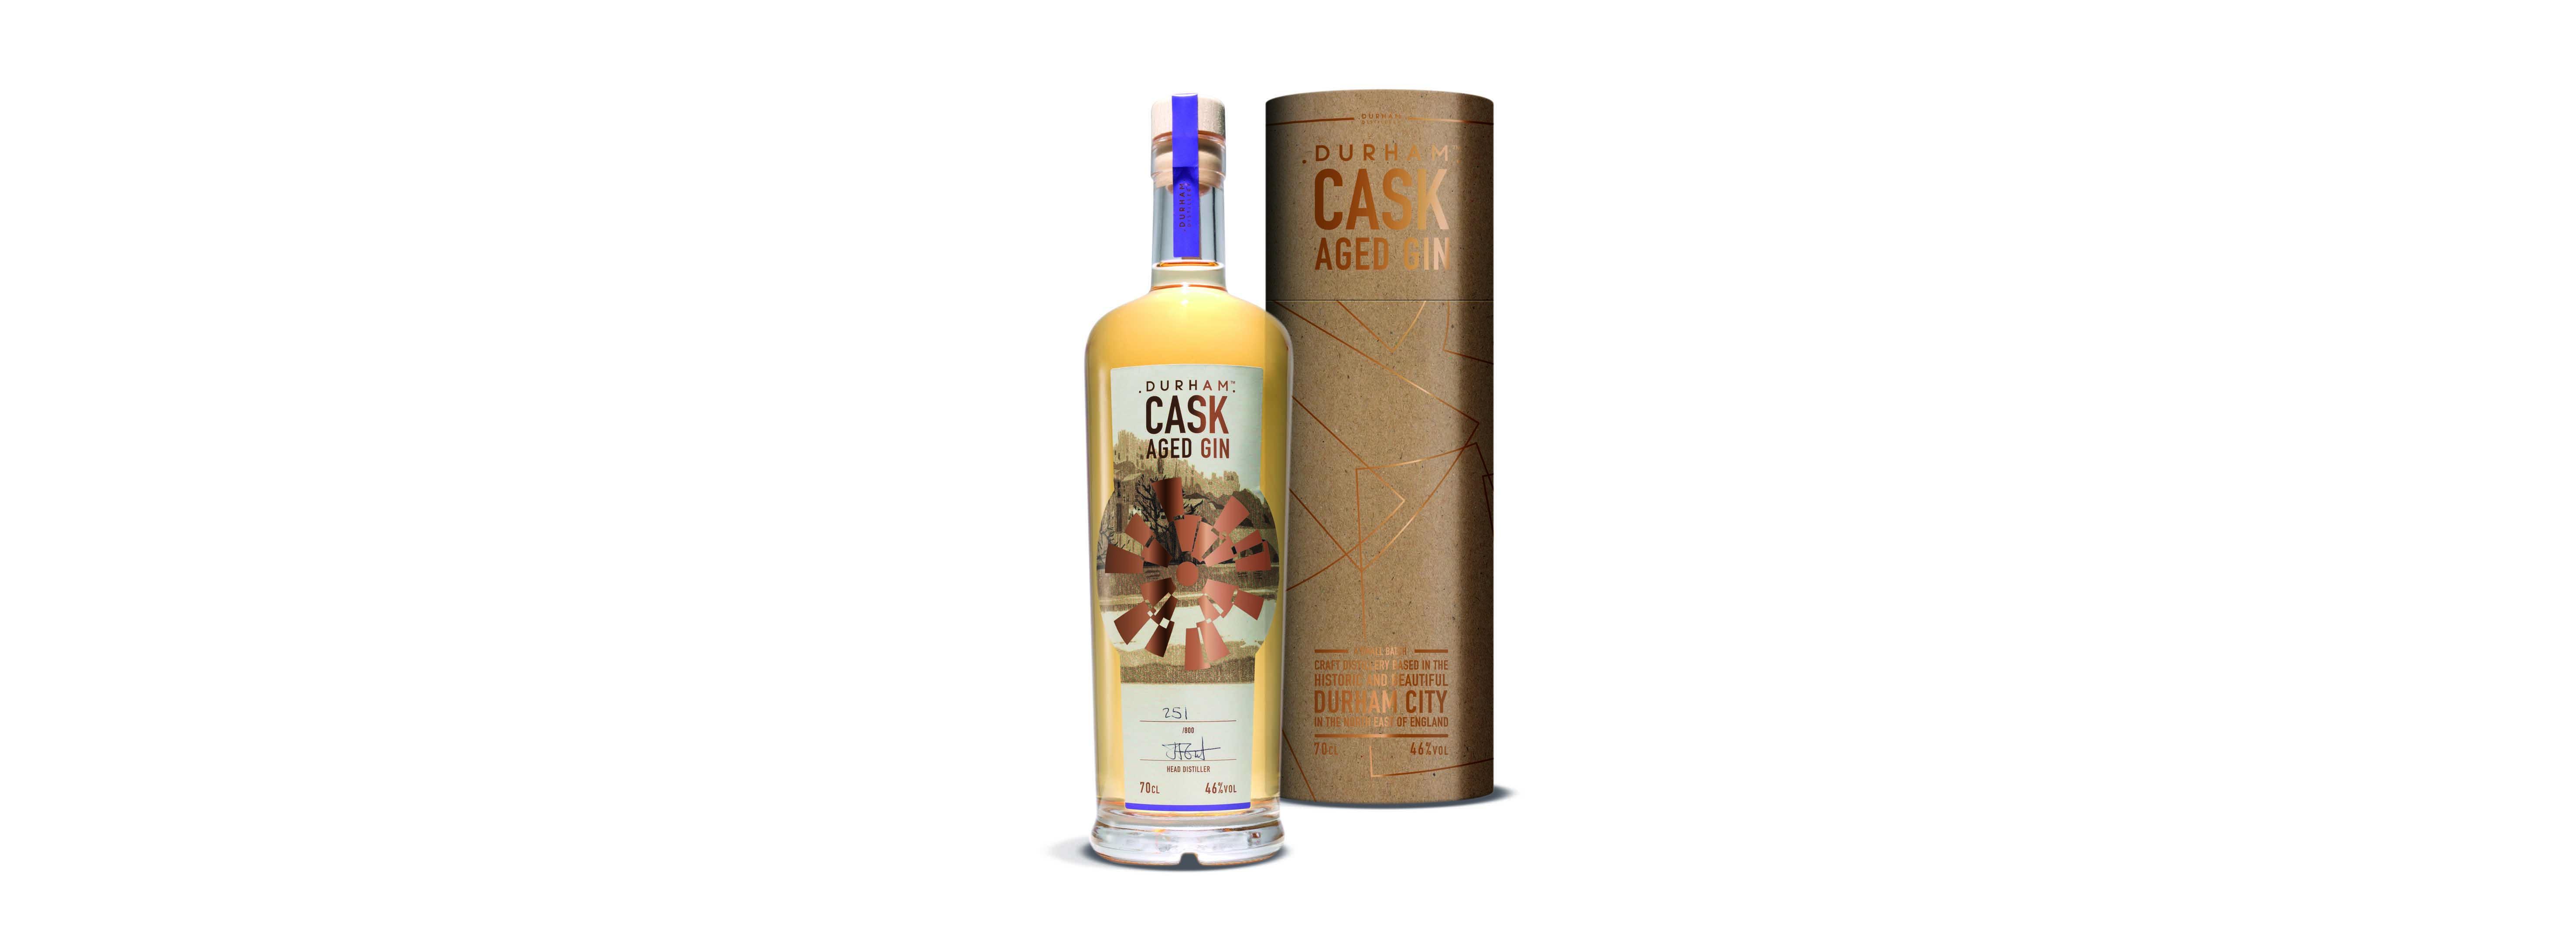 Cask Aged Gin Tube Bottle Visual 2